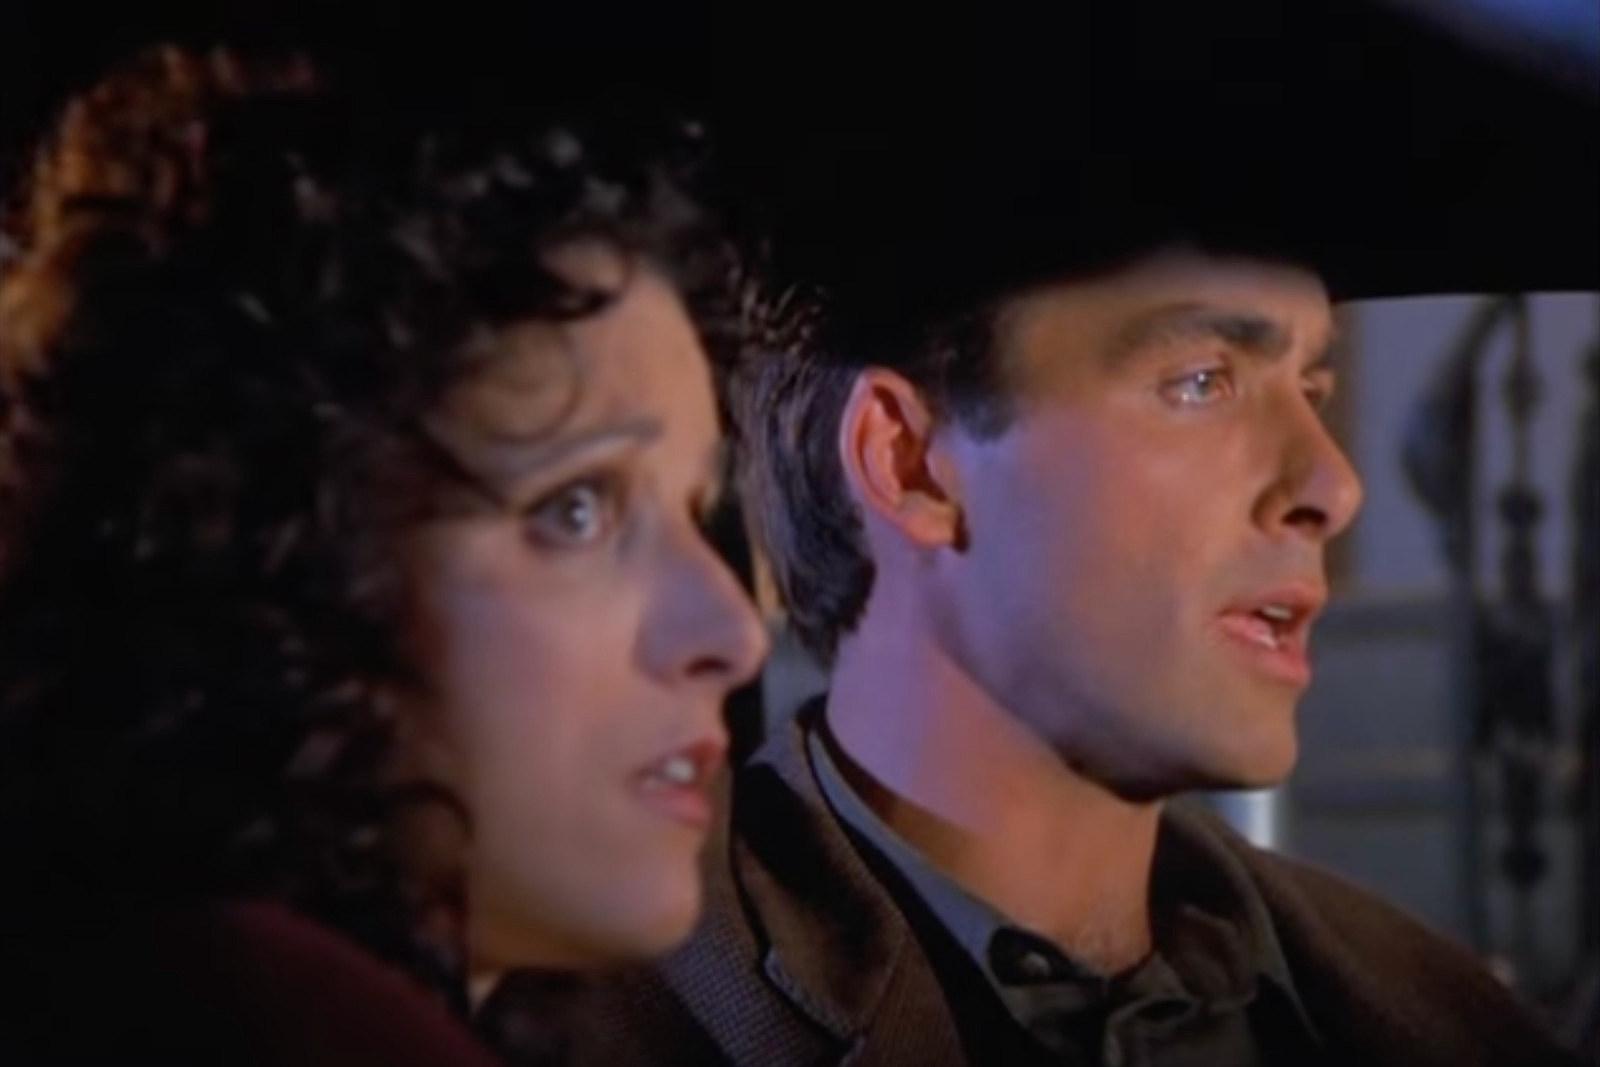 Eagles, Meet Elaine: The 'Seinfeld' 'Desperado' Episode